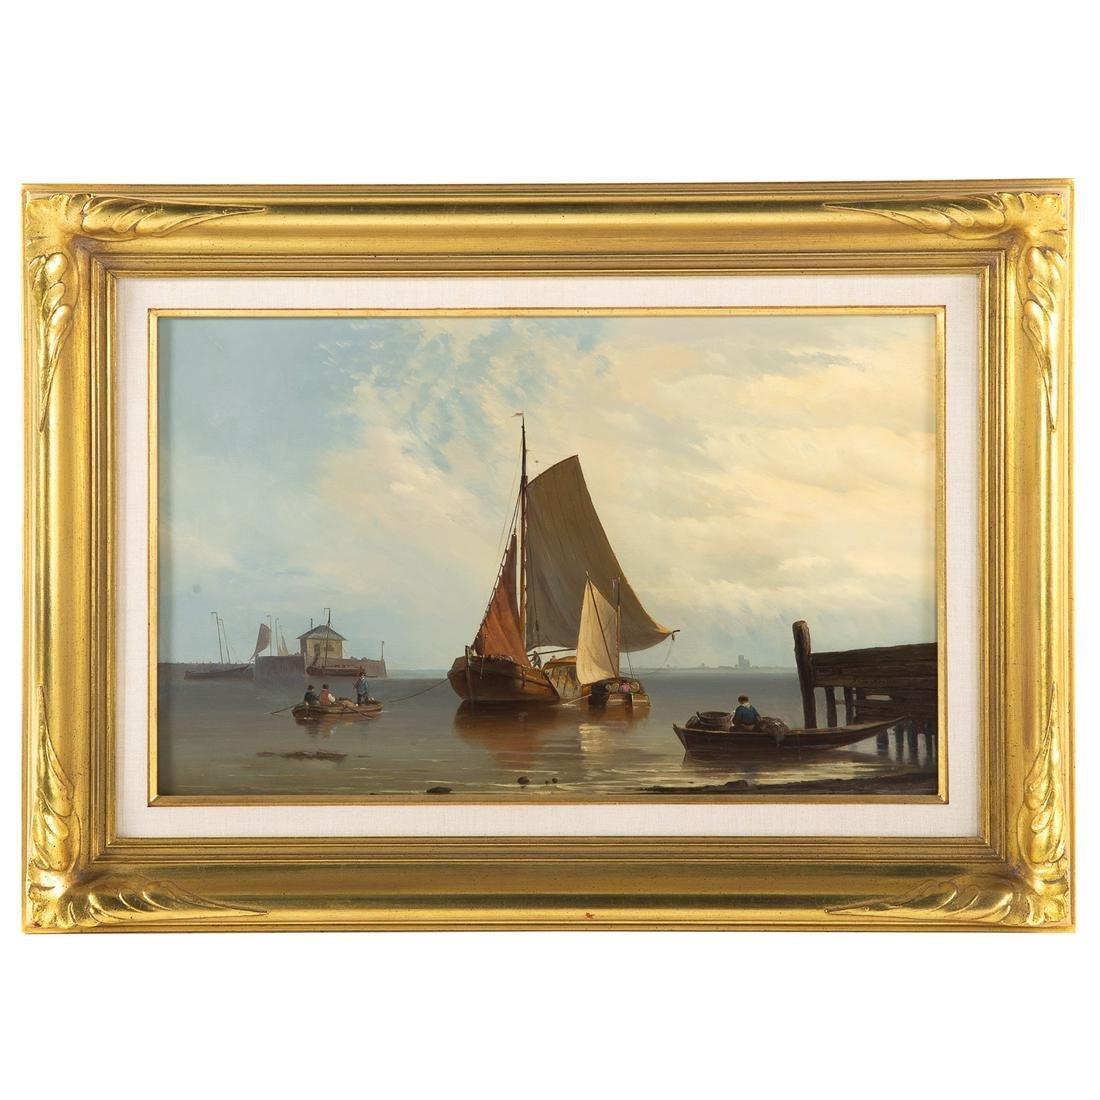 J. De Koster. Fishing Vessels At Shoreline